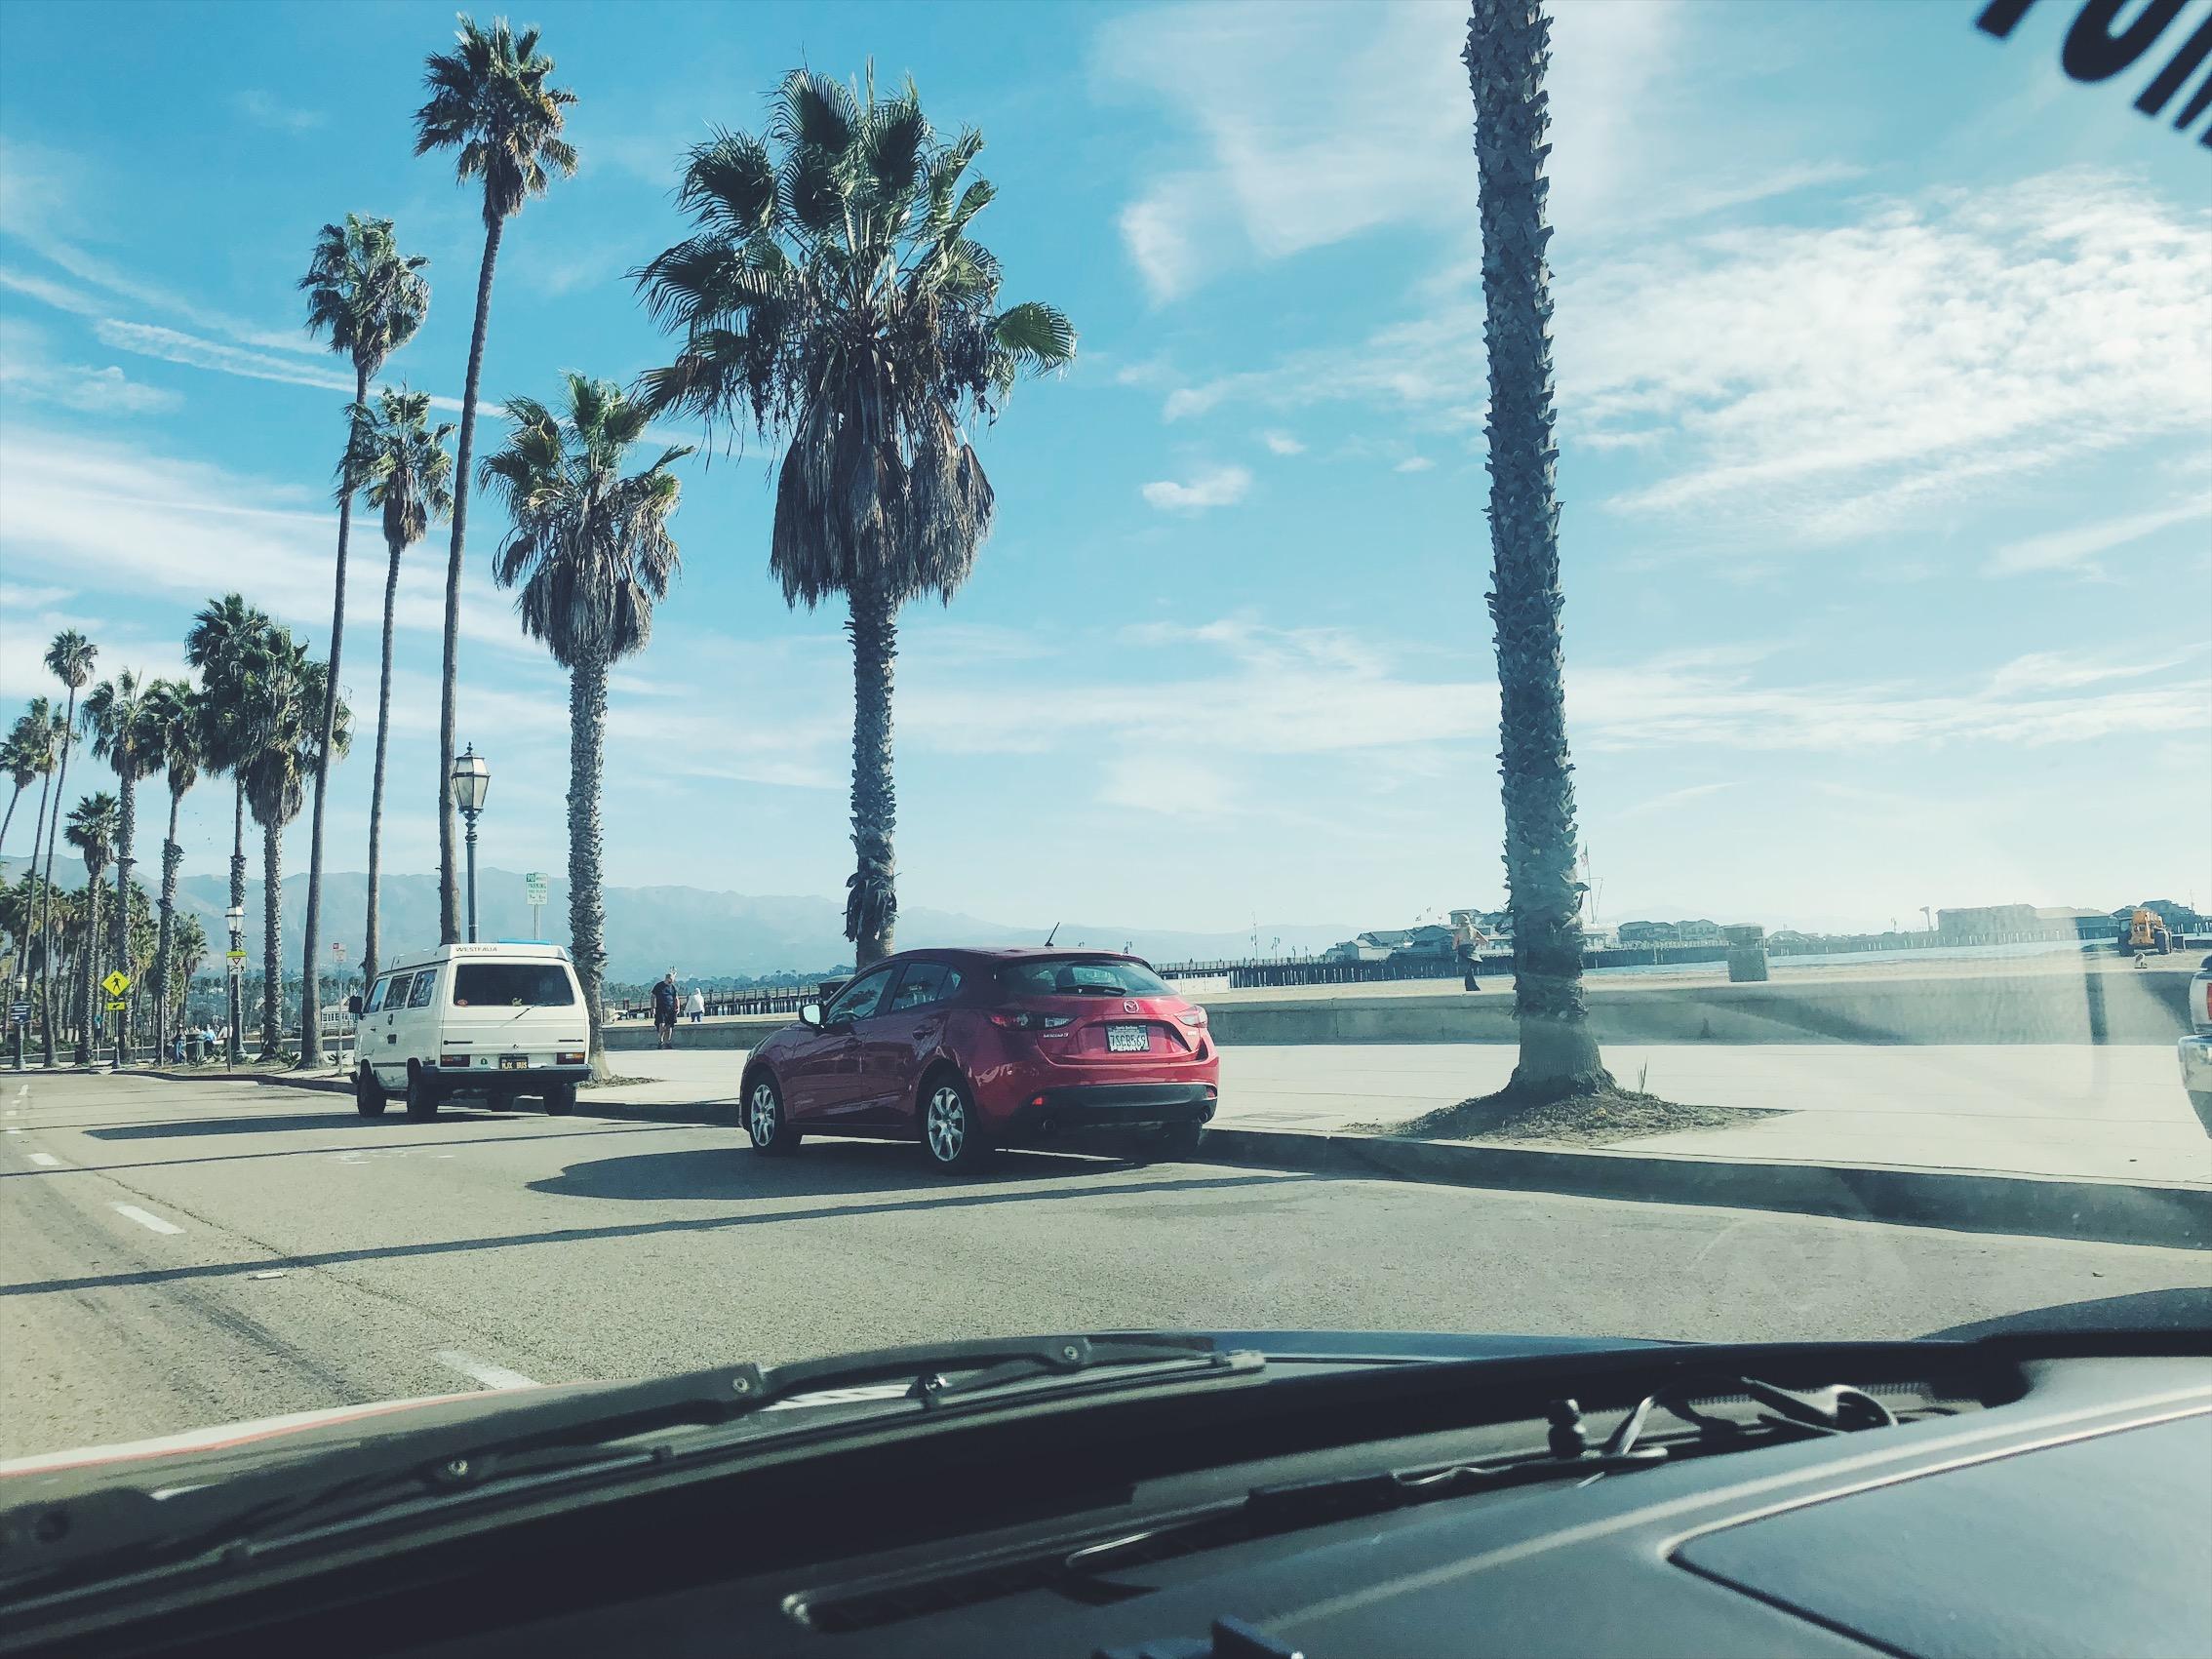 First official stop was Santa Barbara.